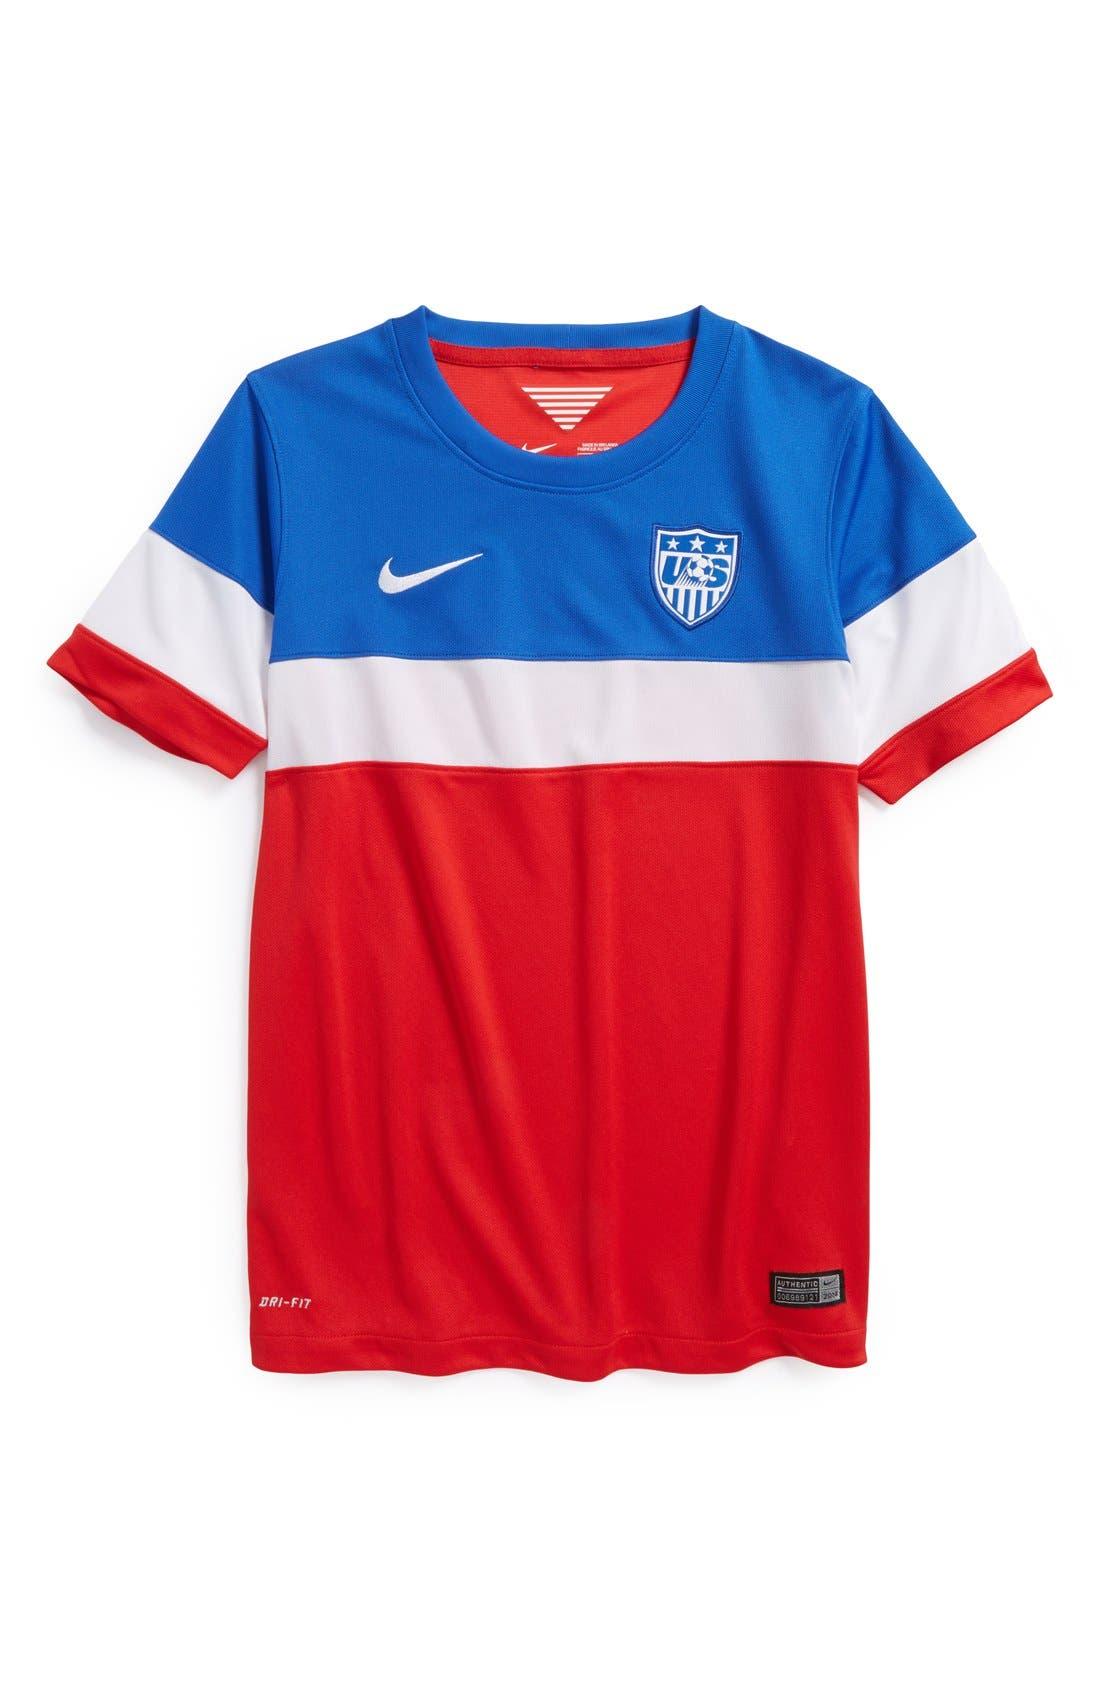 Main Image - Nike 'USA - 2014 Stadium' Dri-FIT World Soccer Jersey (Big Boys)